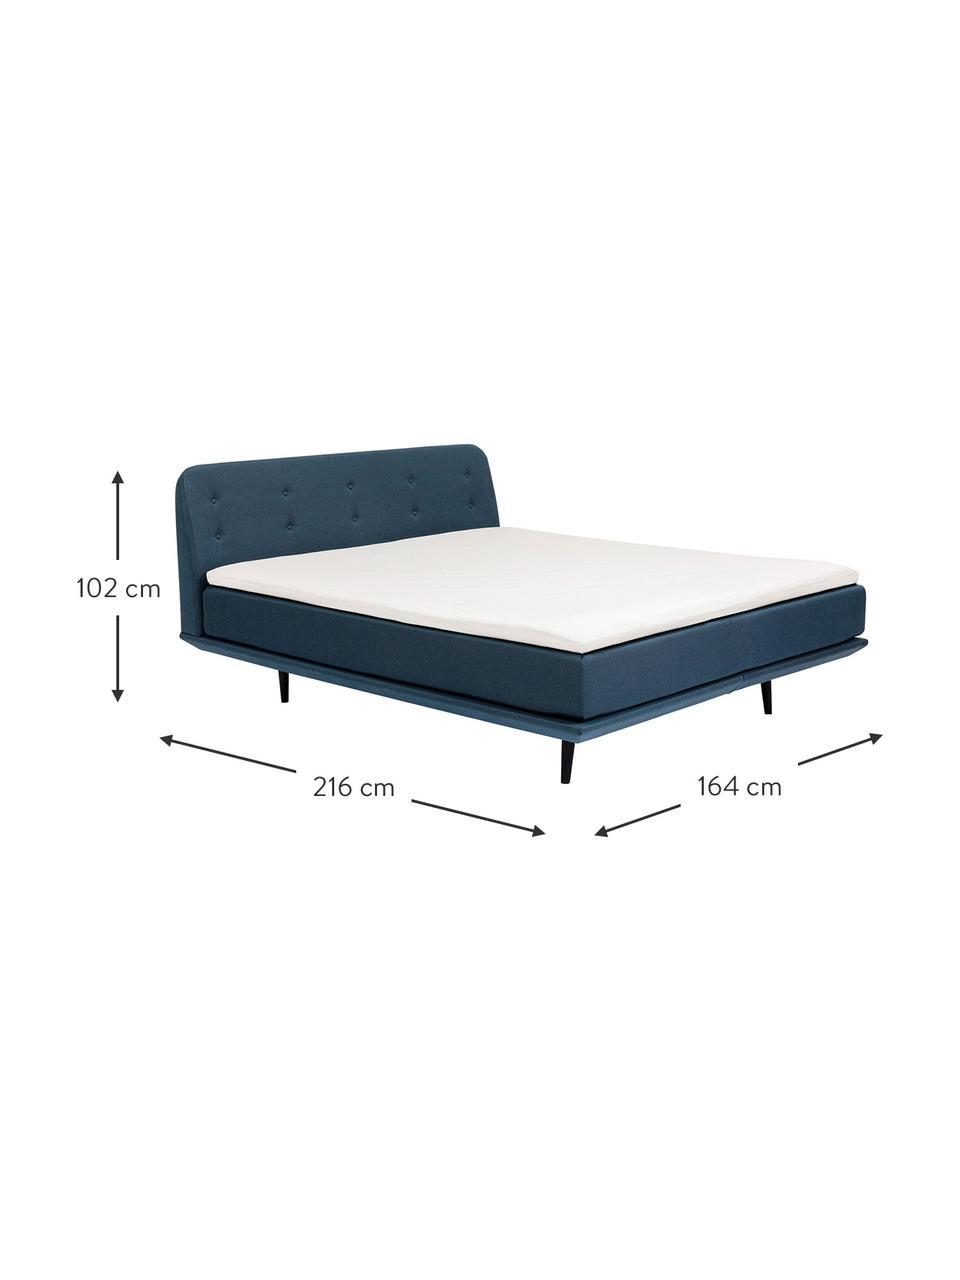 Gestoffeerd bed Luna in blauw, Frame: massief gelakt beukenhout, Bekleding: 100% polyester, Poten: massief gelakt beukenhout, Geweven stof blauw, 180 x 200 cm